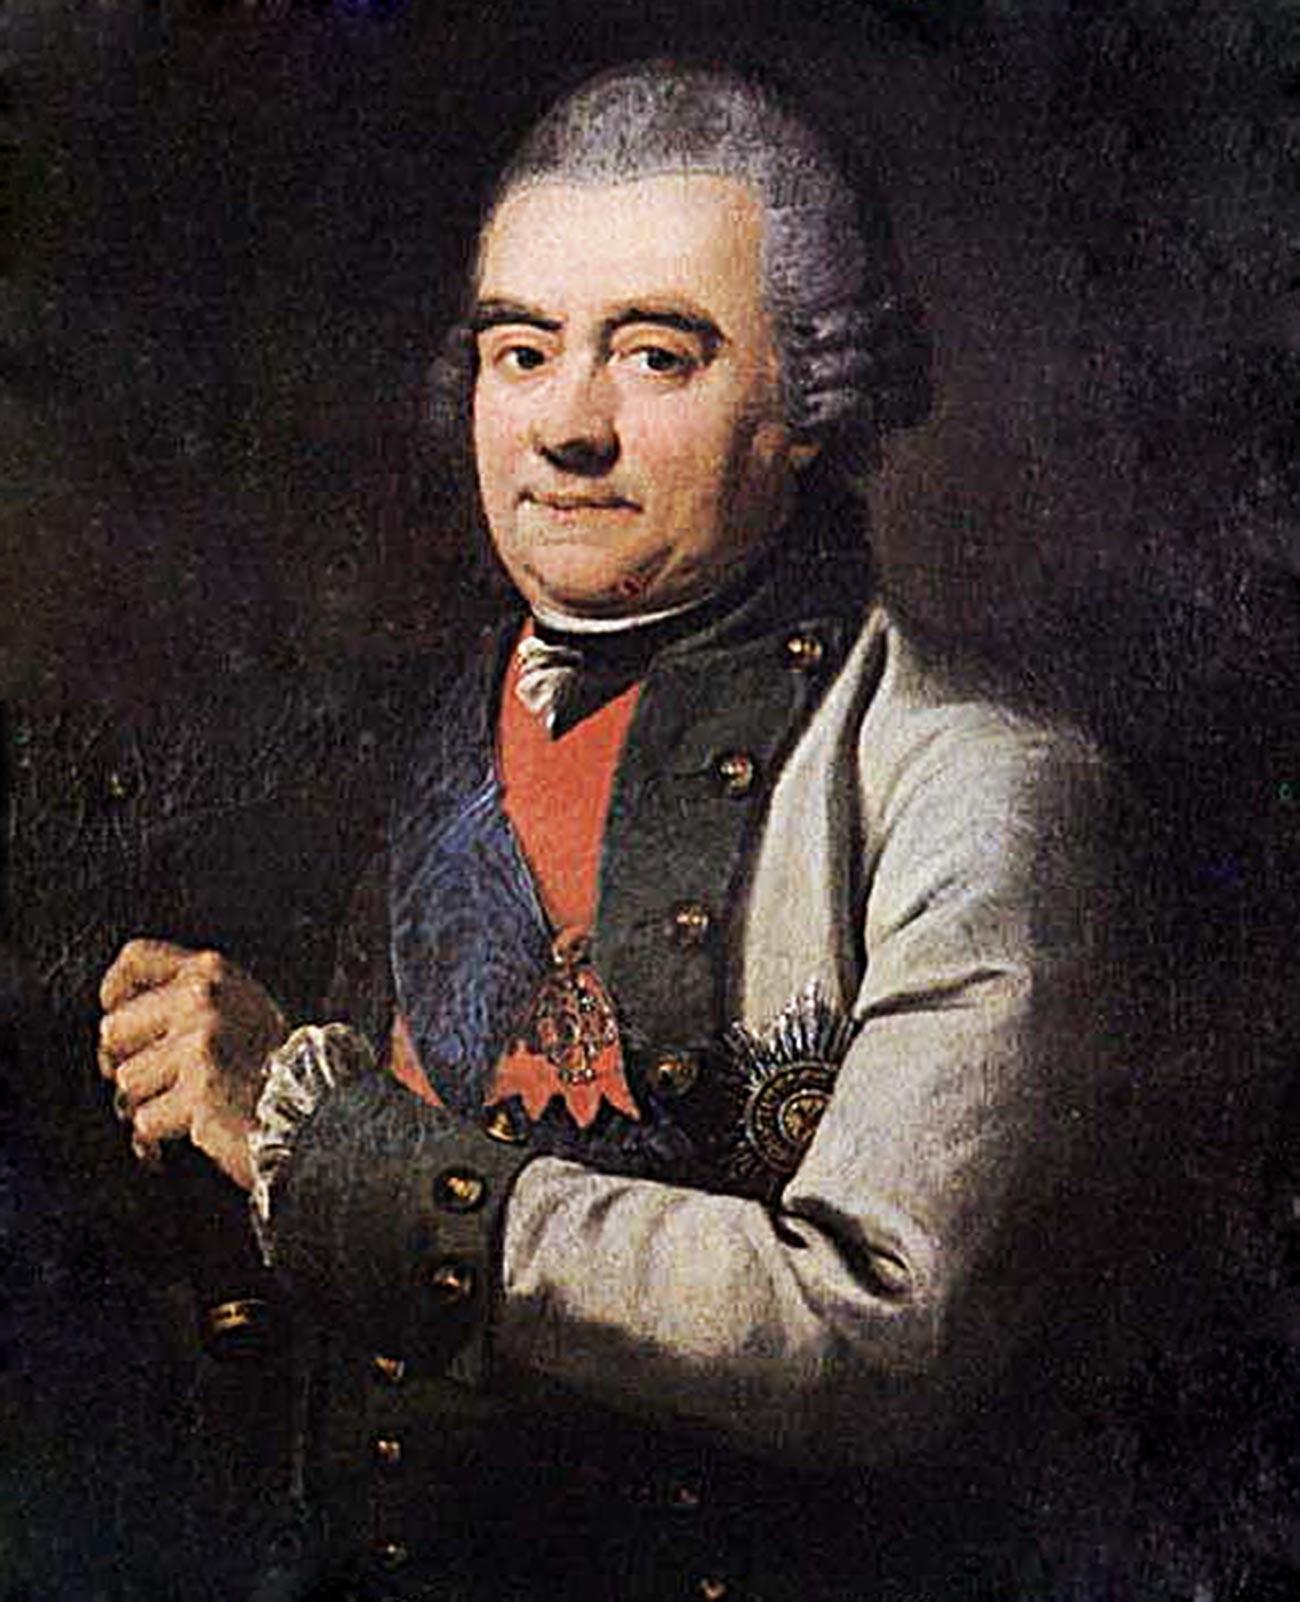 Grigori Spiridov